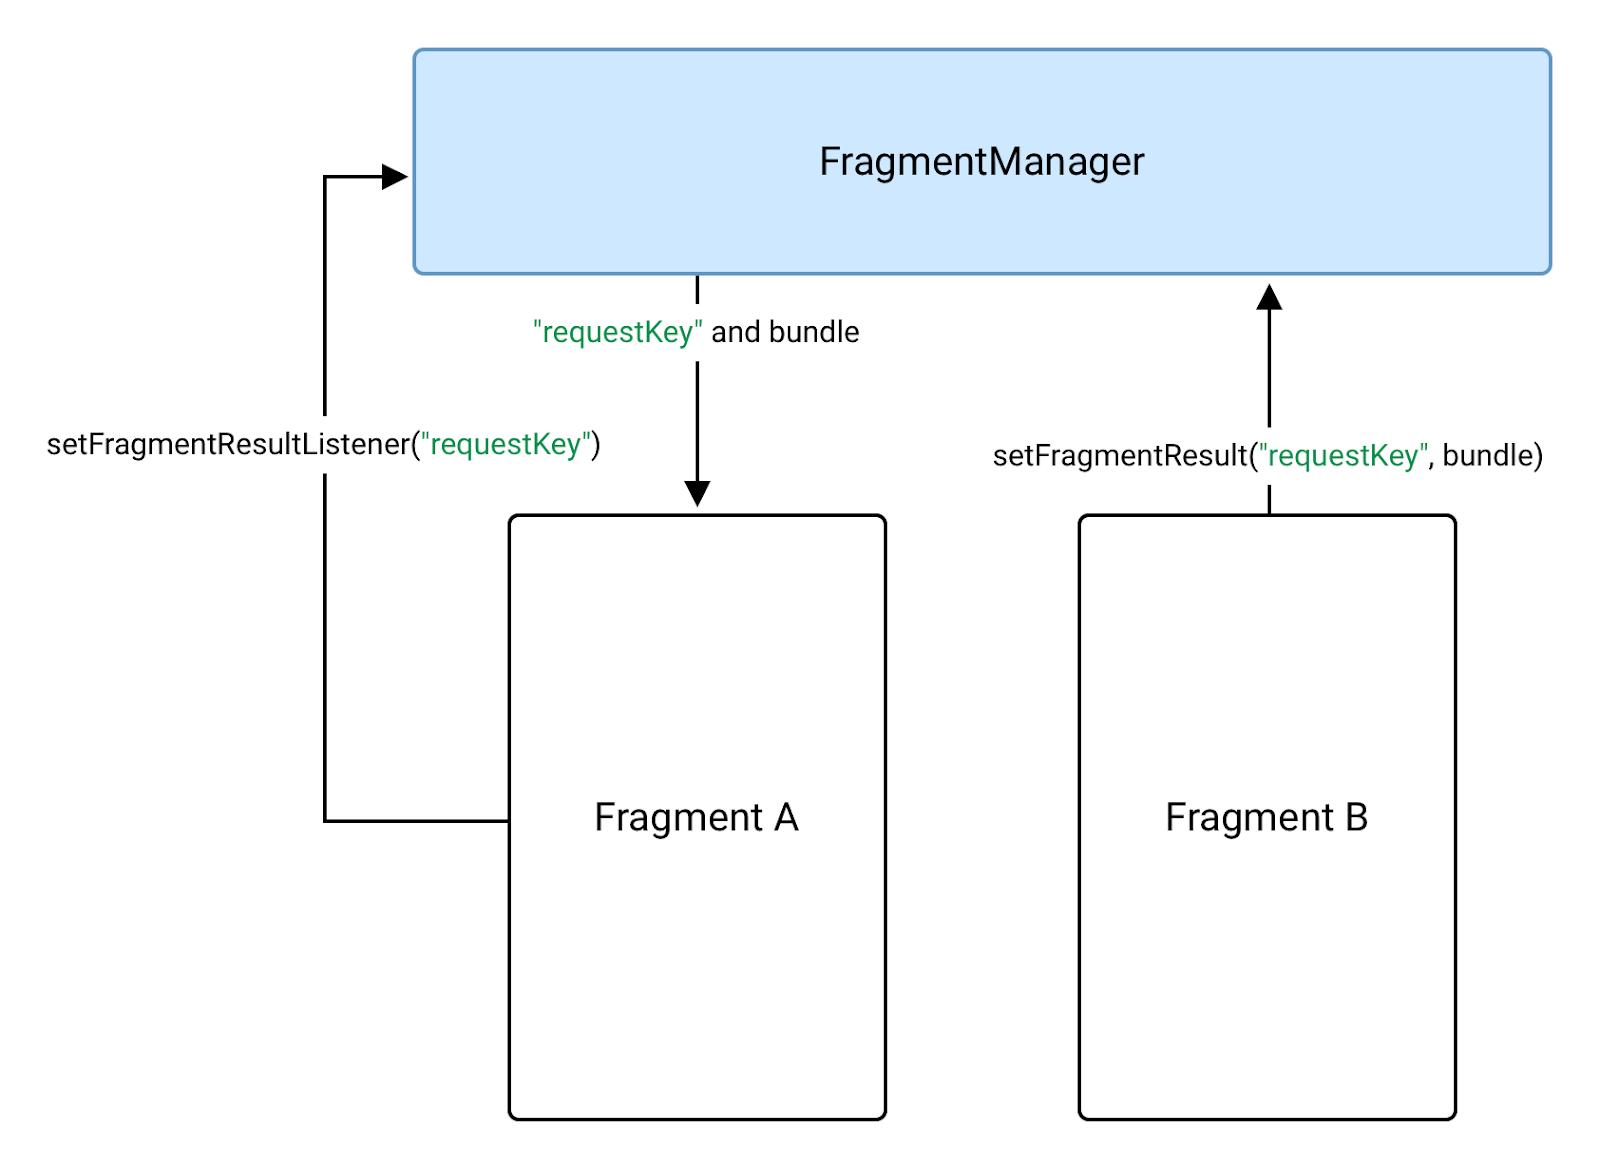 fragmen b mengirim data ke fragmen a menggunakan FragmentManager